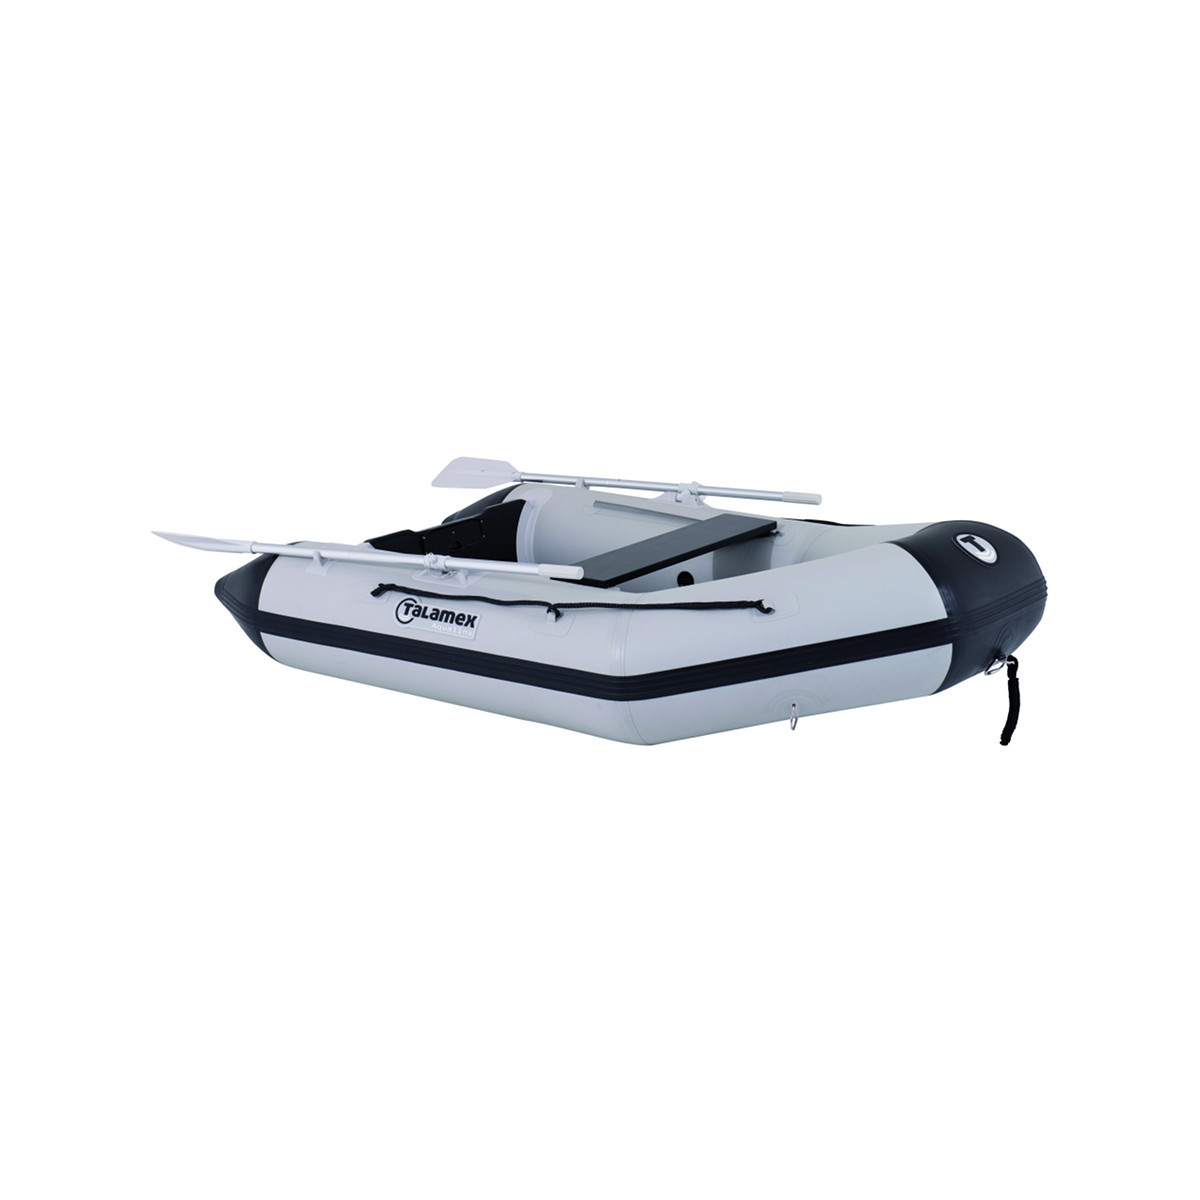 Talamex Aqualine QLA230 opblaasbare rubberboot met opblaasbare bodem, lengte 2,30m, lengte 2,30m, grijs